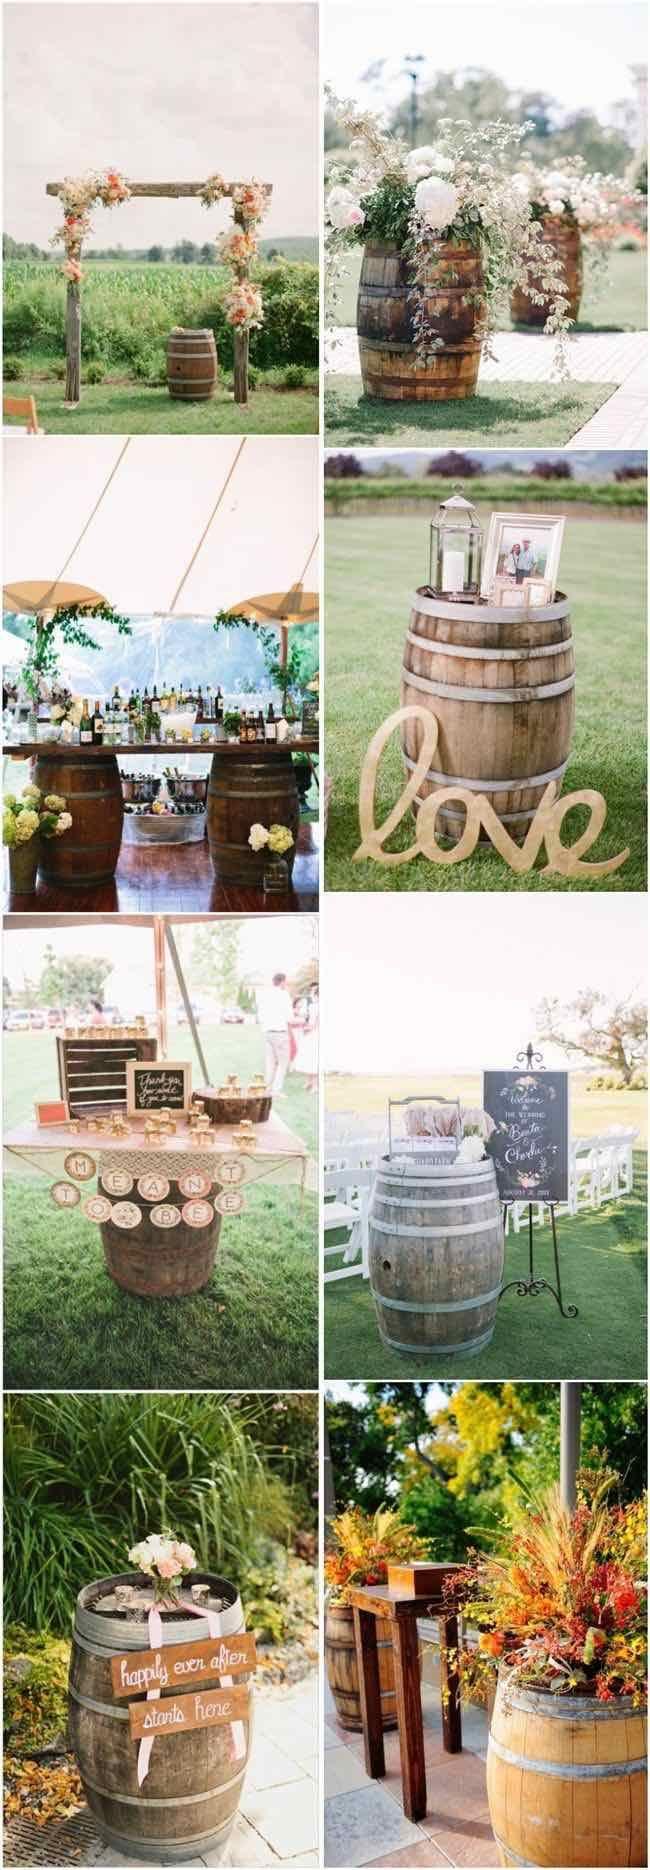 como decorar una boda country shabby chic original